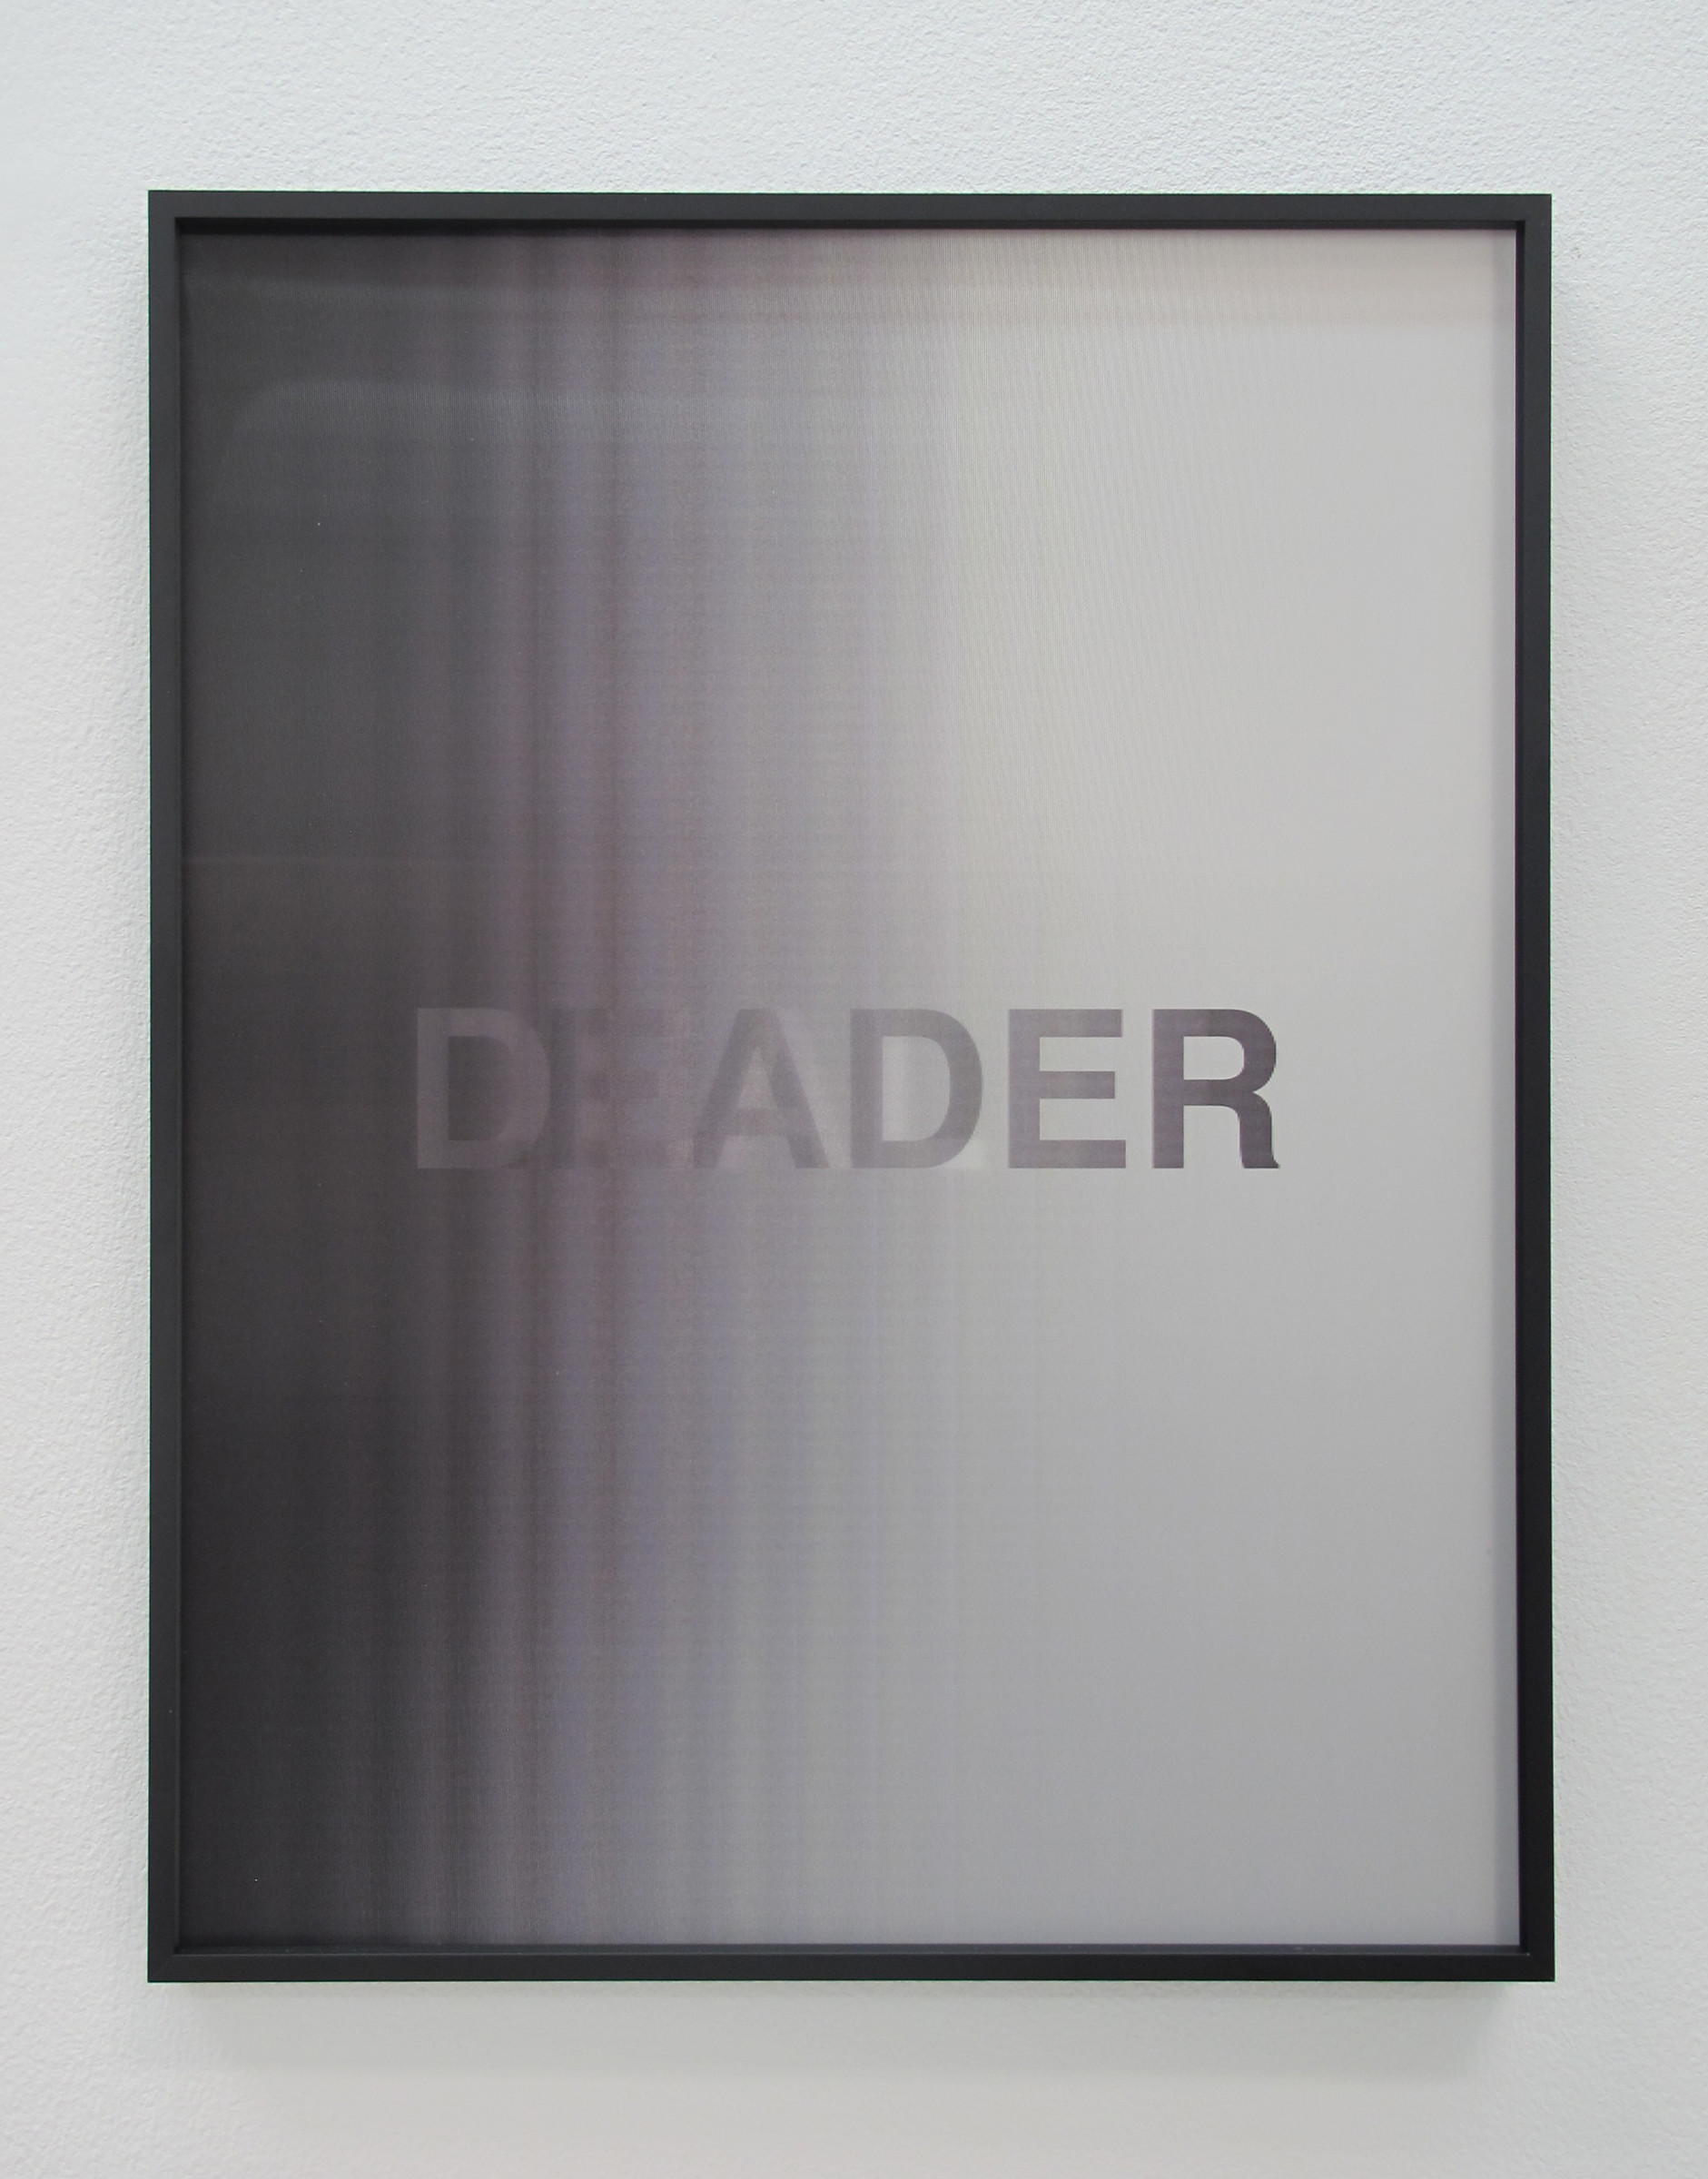 <span class=&#34;link fancybox-details-link&#34;><a href=&#34;/exhibitions/41/works/artworks1583/&#34;>View Detail Page</a></span><div class=&#34;medium&#34;> HD lenticular print</div> <div class=&#34;dimensions&#34;>50 x 40 cm<br /> 19 3/4 x 15 3/4 in</div> <div class=&#34;edition_details&#34;>Edition of 3 + 1 AP</div>